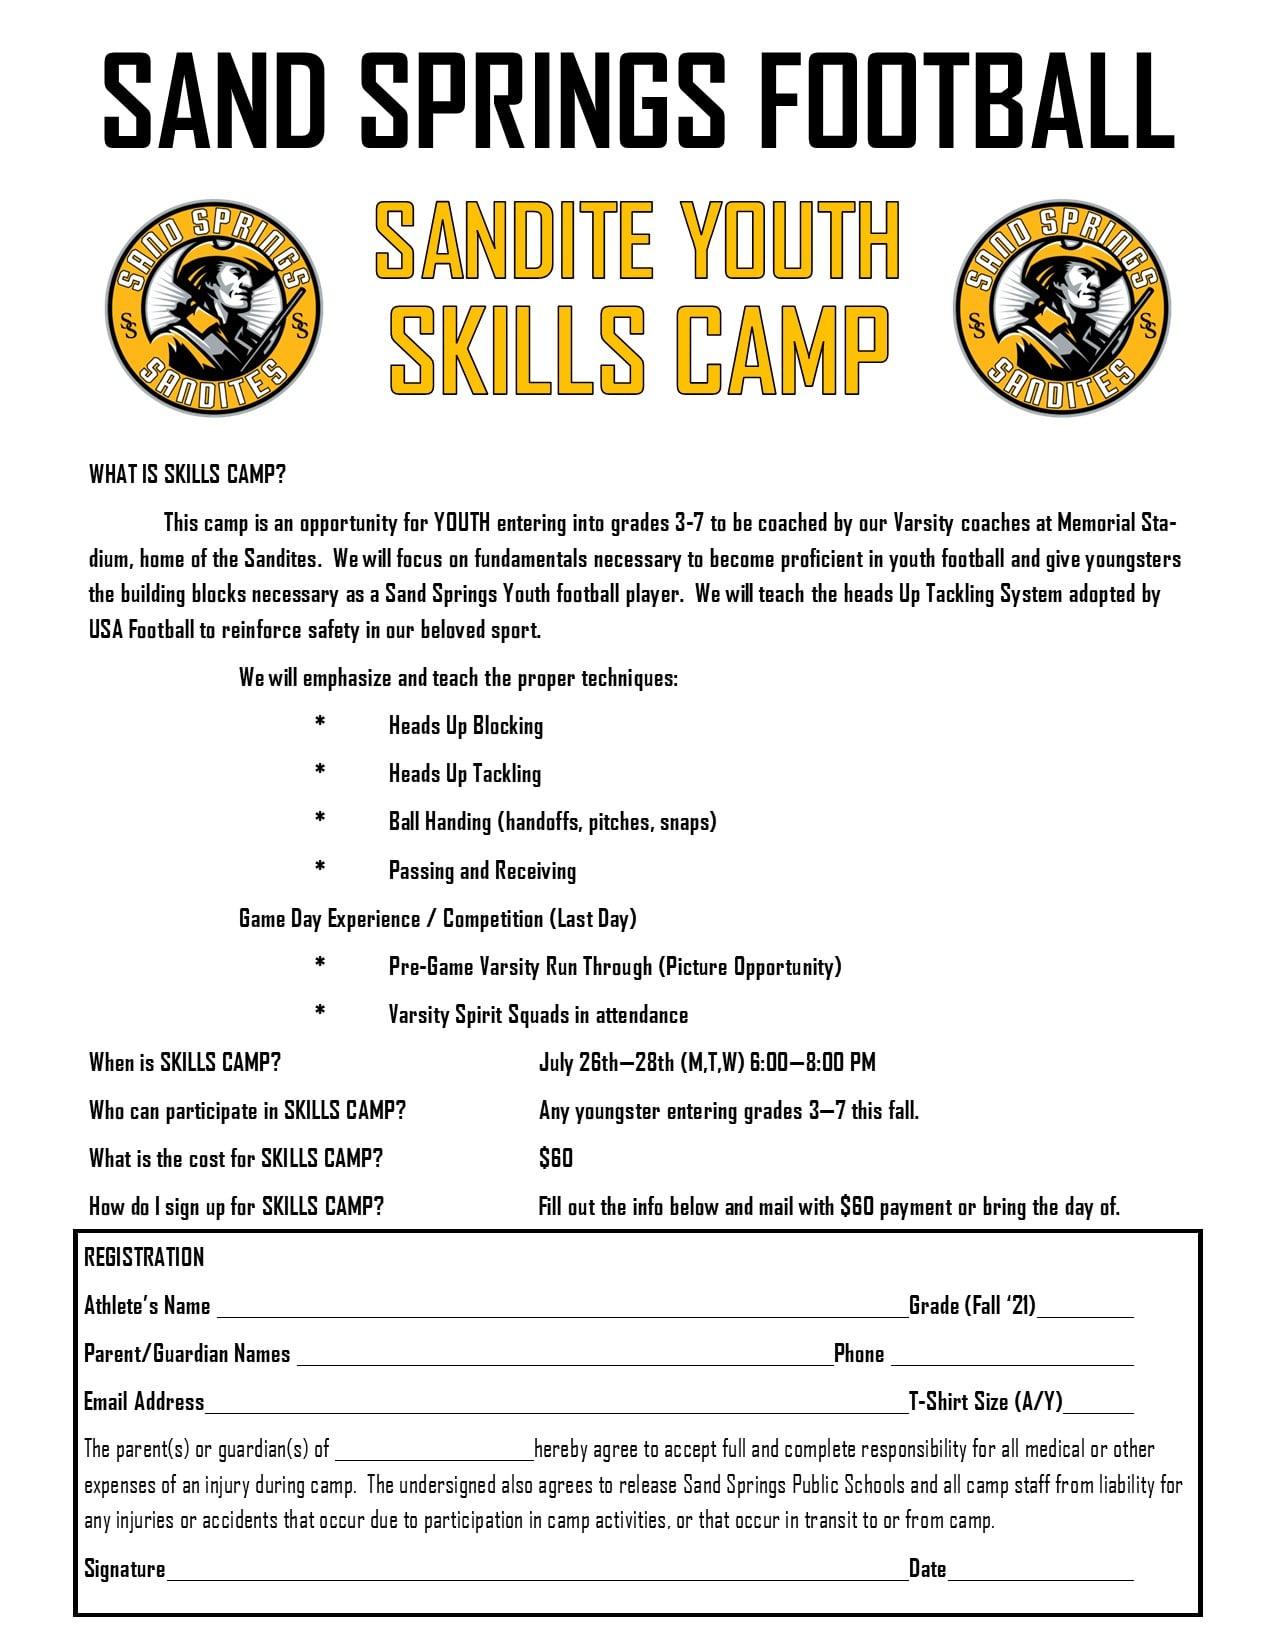 SSPS Skills Camp